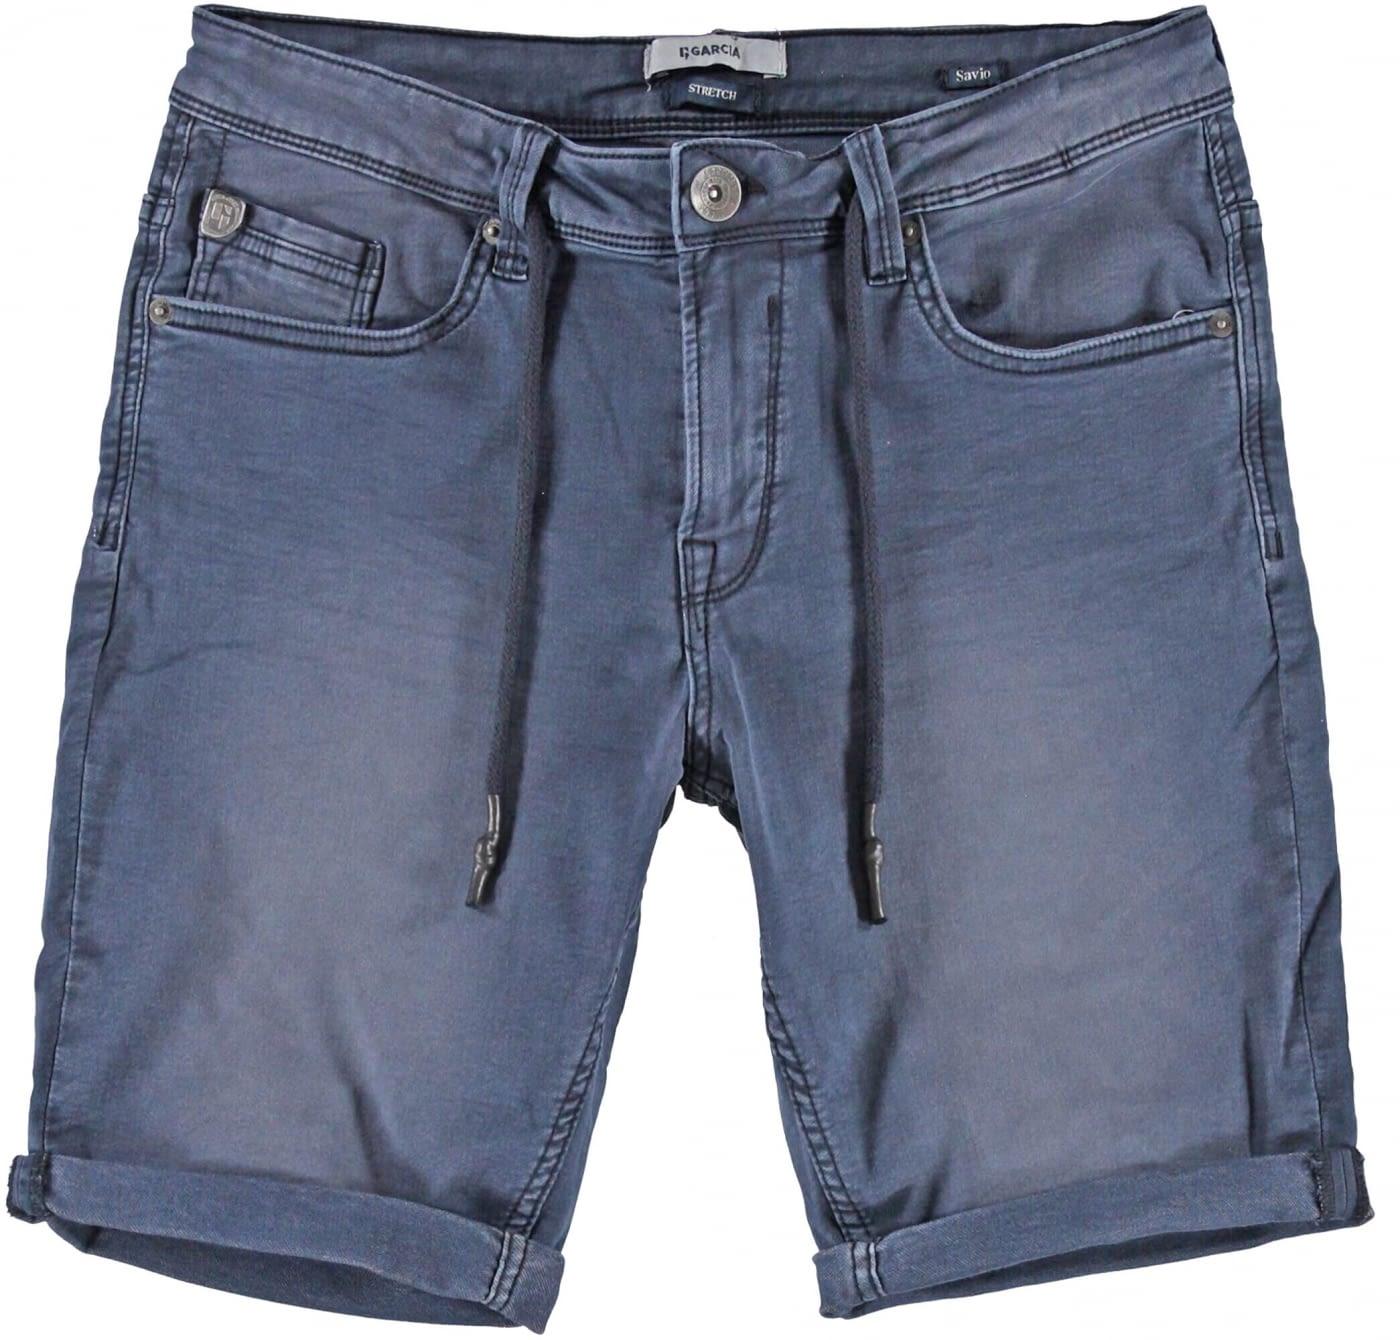 GARCIA pantalón corto Savio